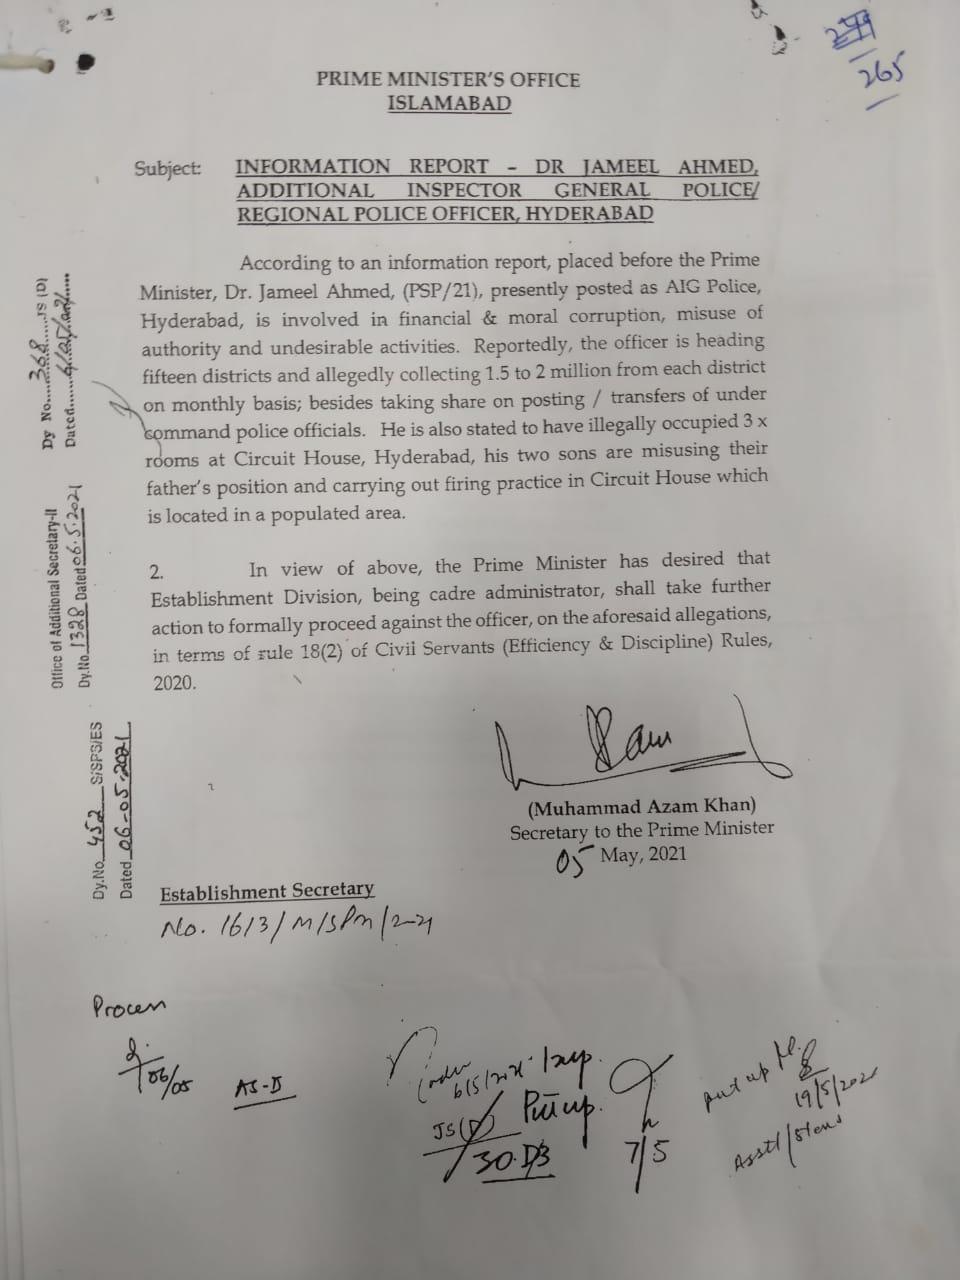 PM Imran Khans letter to the Establishment Division.